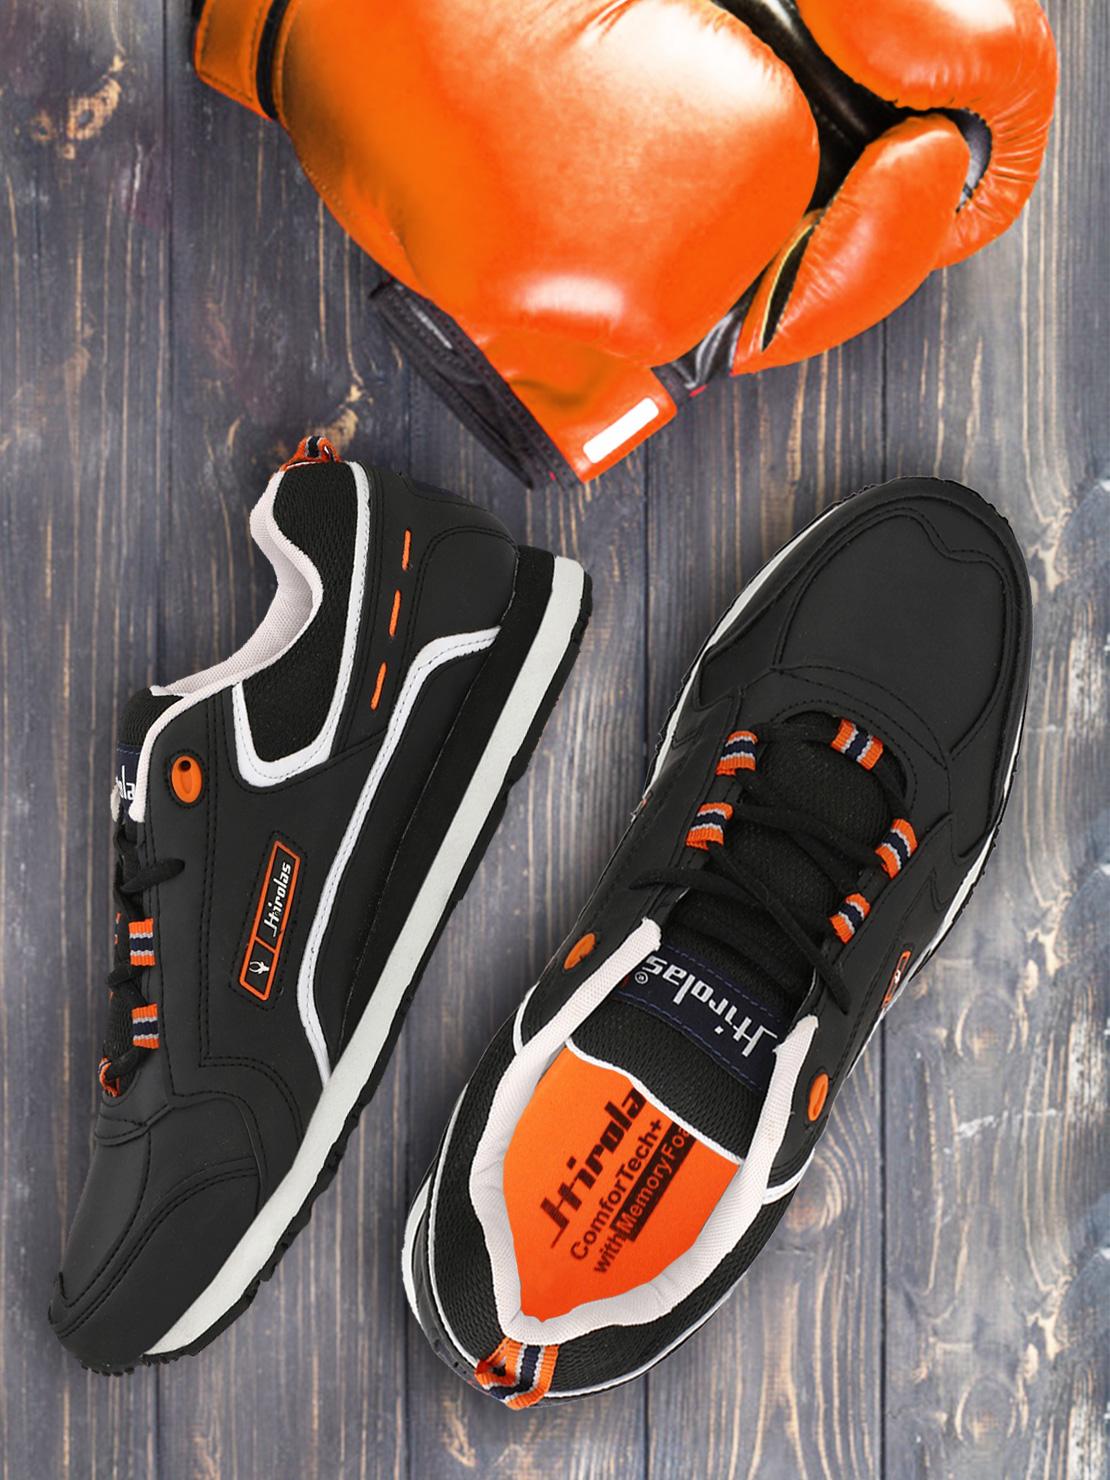 Hirolas   Hirolas Multi Sport Shock Absorbing Walking  Running Fitness Athletic Training Gym Sneaker Shoes - Black